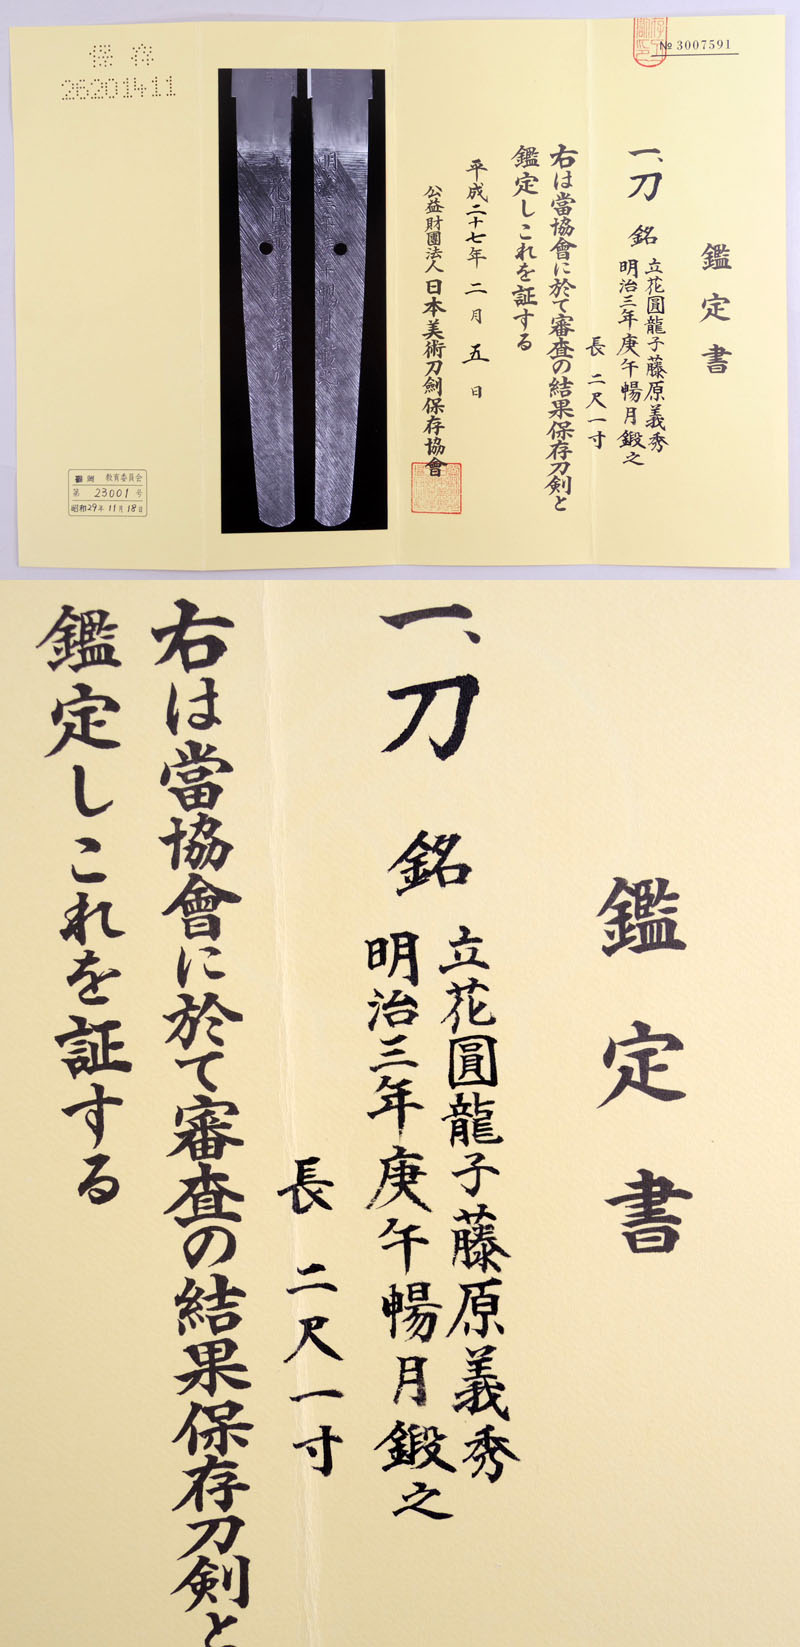 立花圓龍子藤原義秀 Picture of Certificate